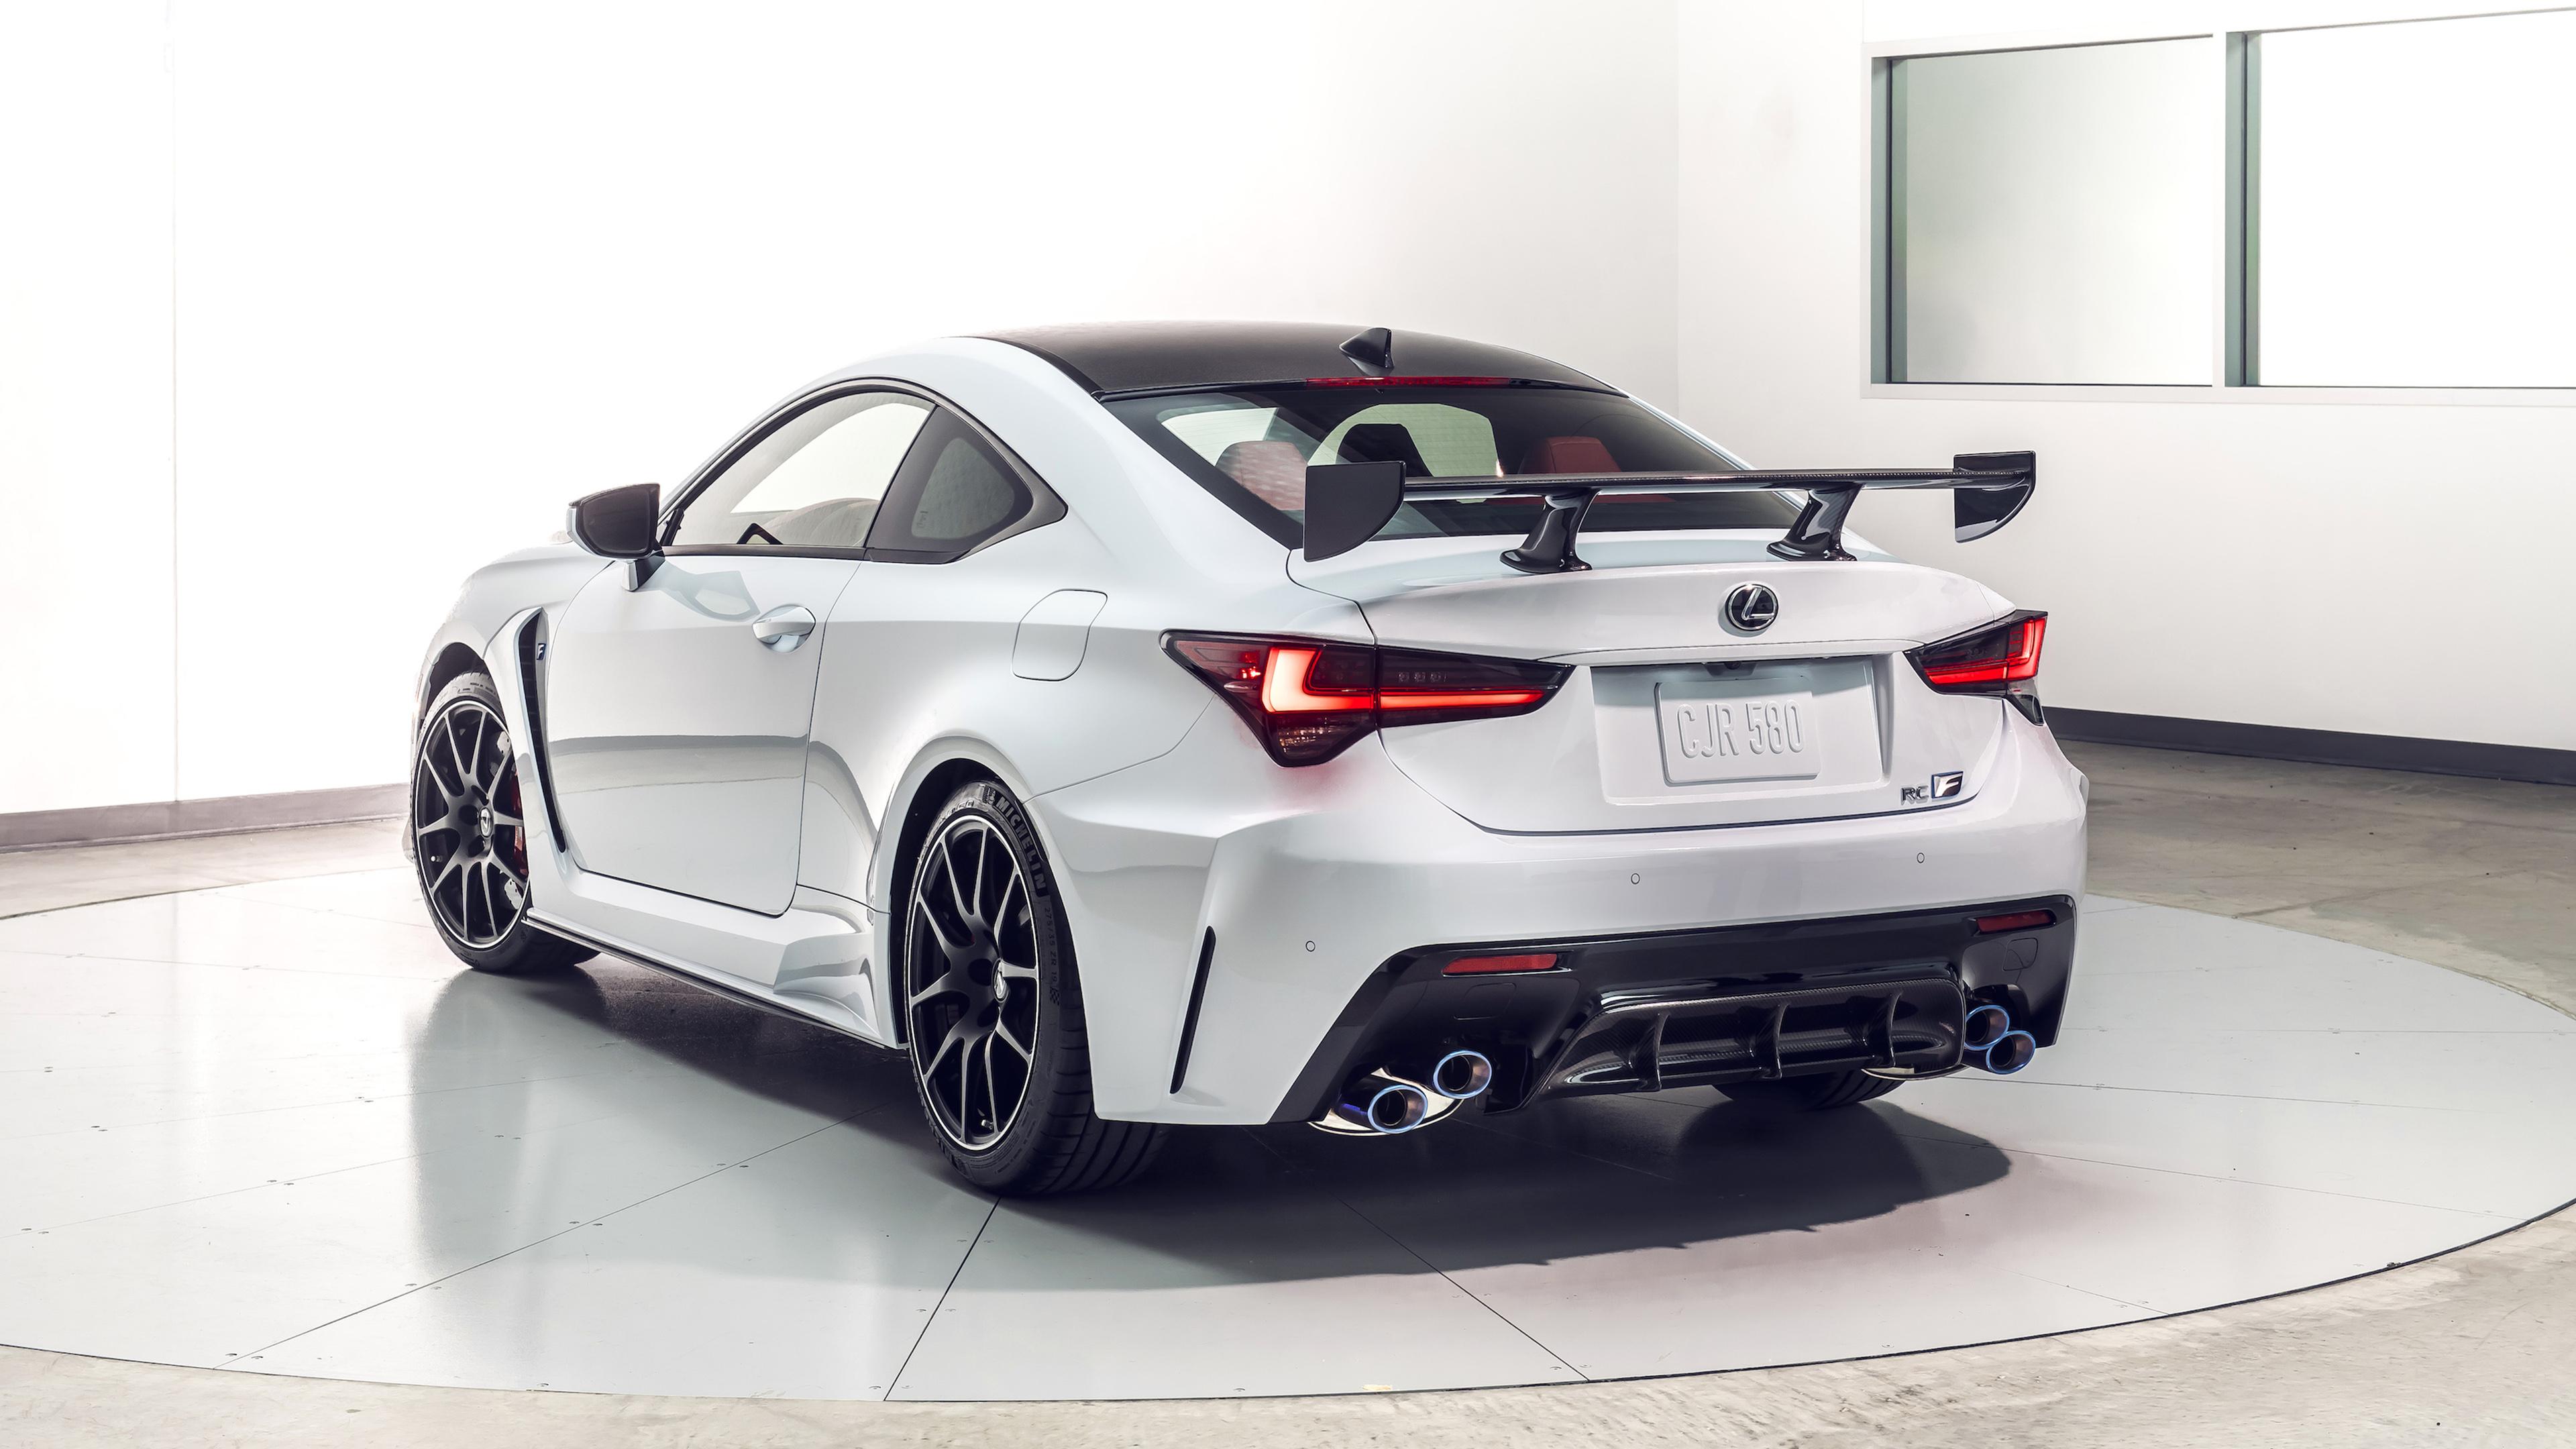 2020 Lexus Rc F Track Edition 4k 3 Wallpaper Hd Car Wallpapers Id 11906